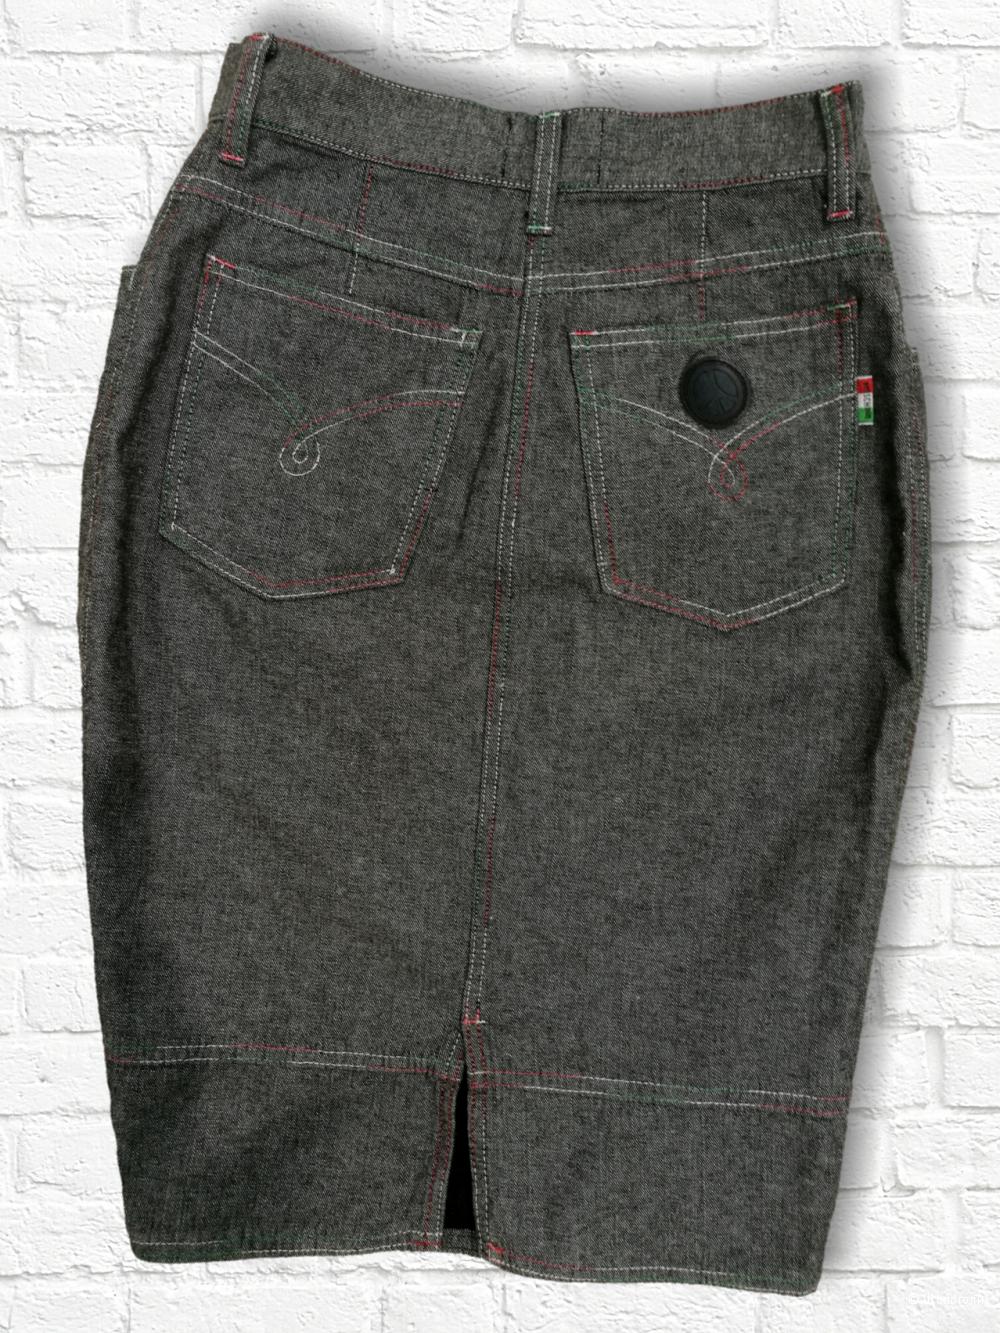 Moschino jeans.Оригинал.Джинсовая юбка. 44it. .